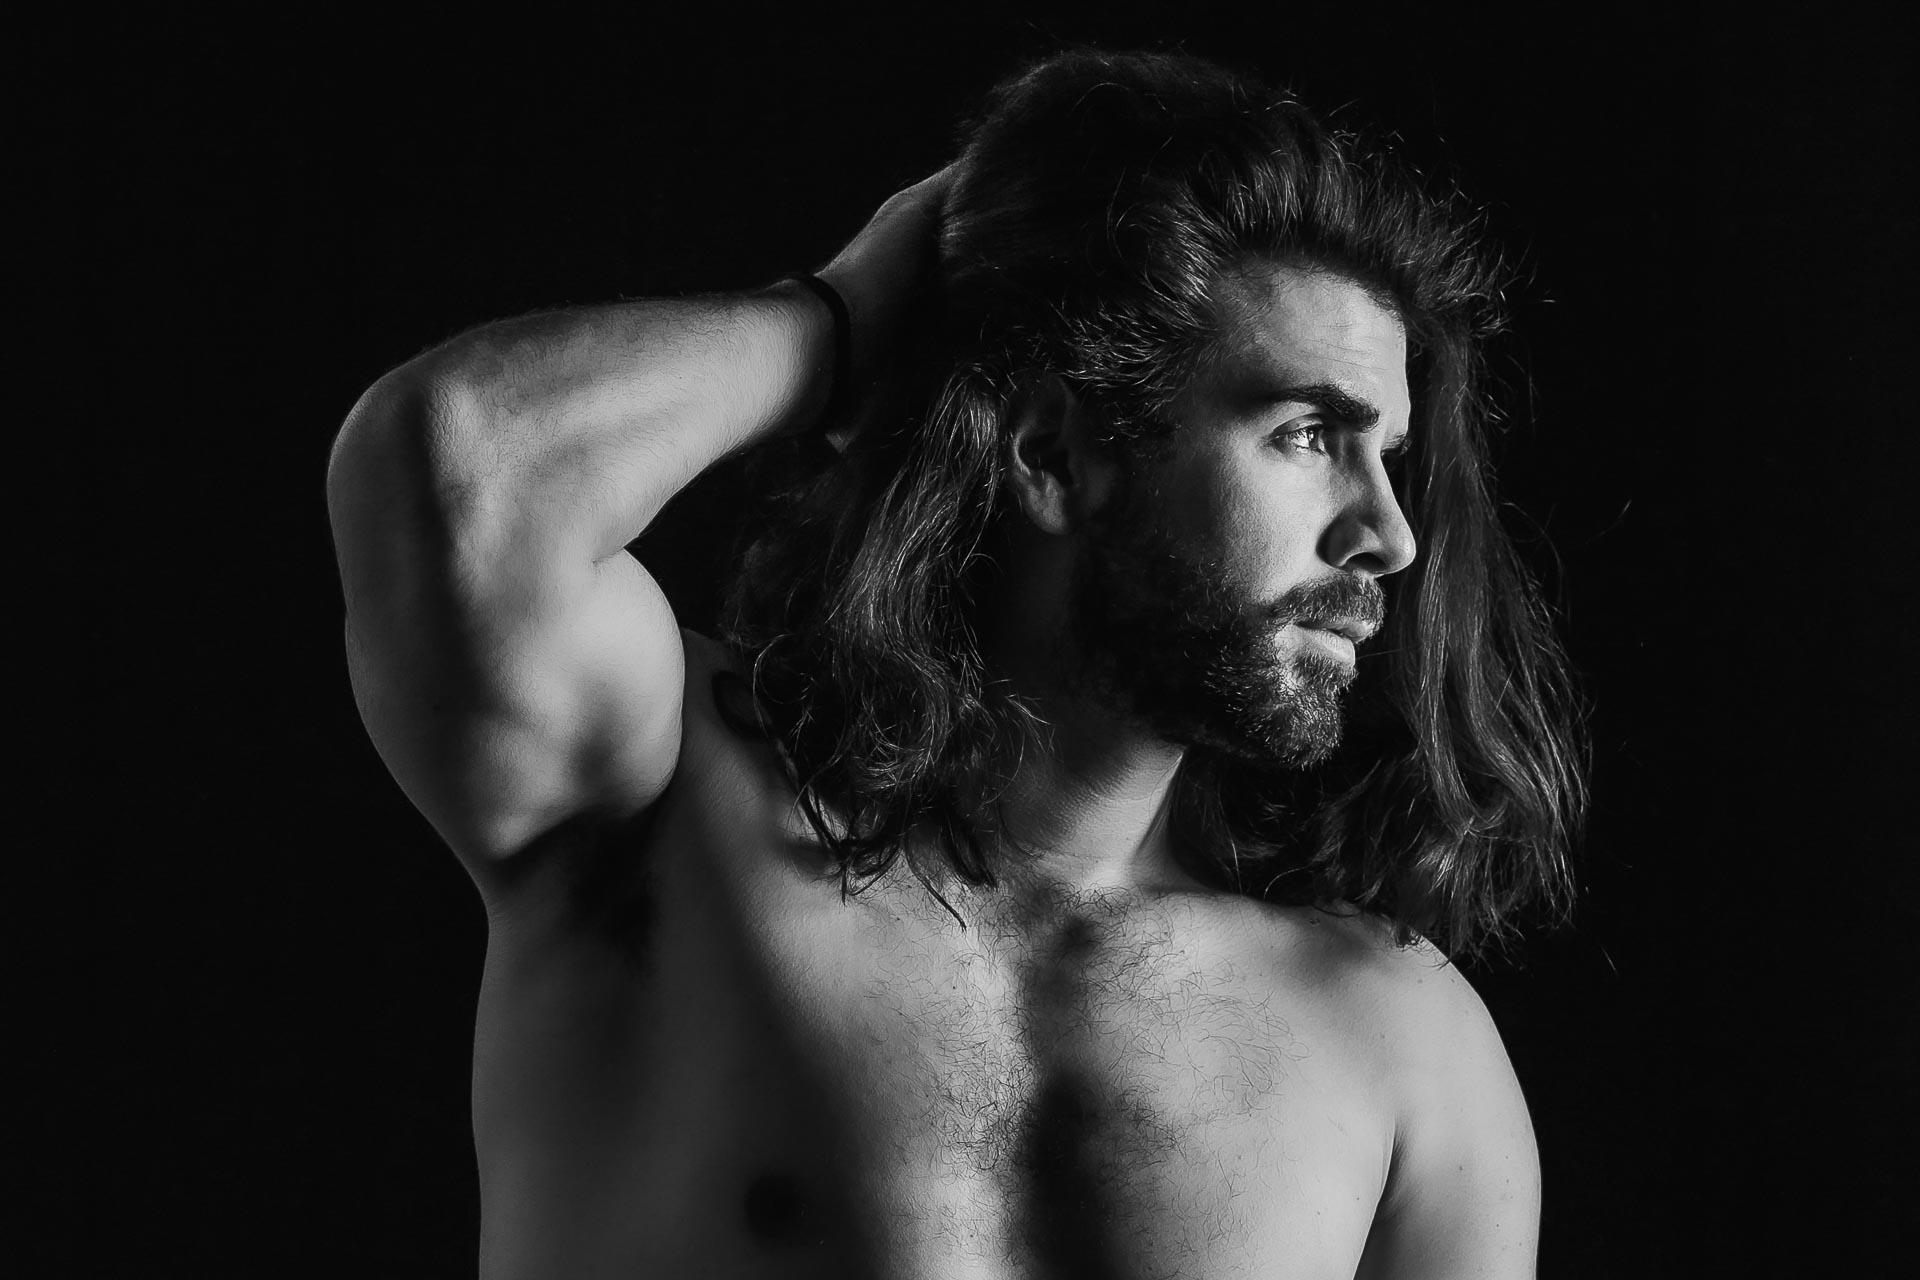 Männeraktfotografie